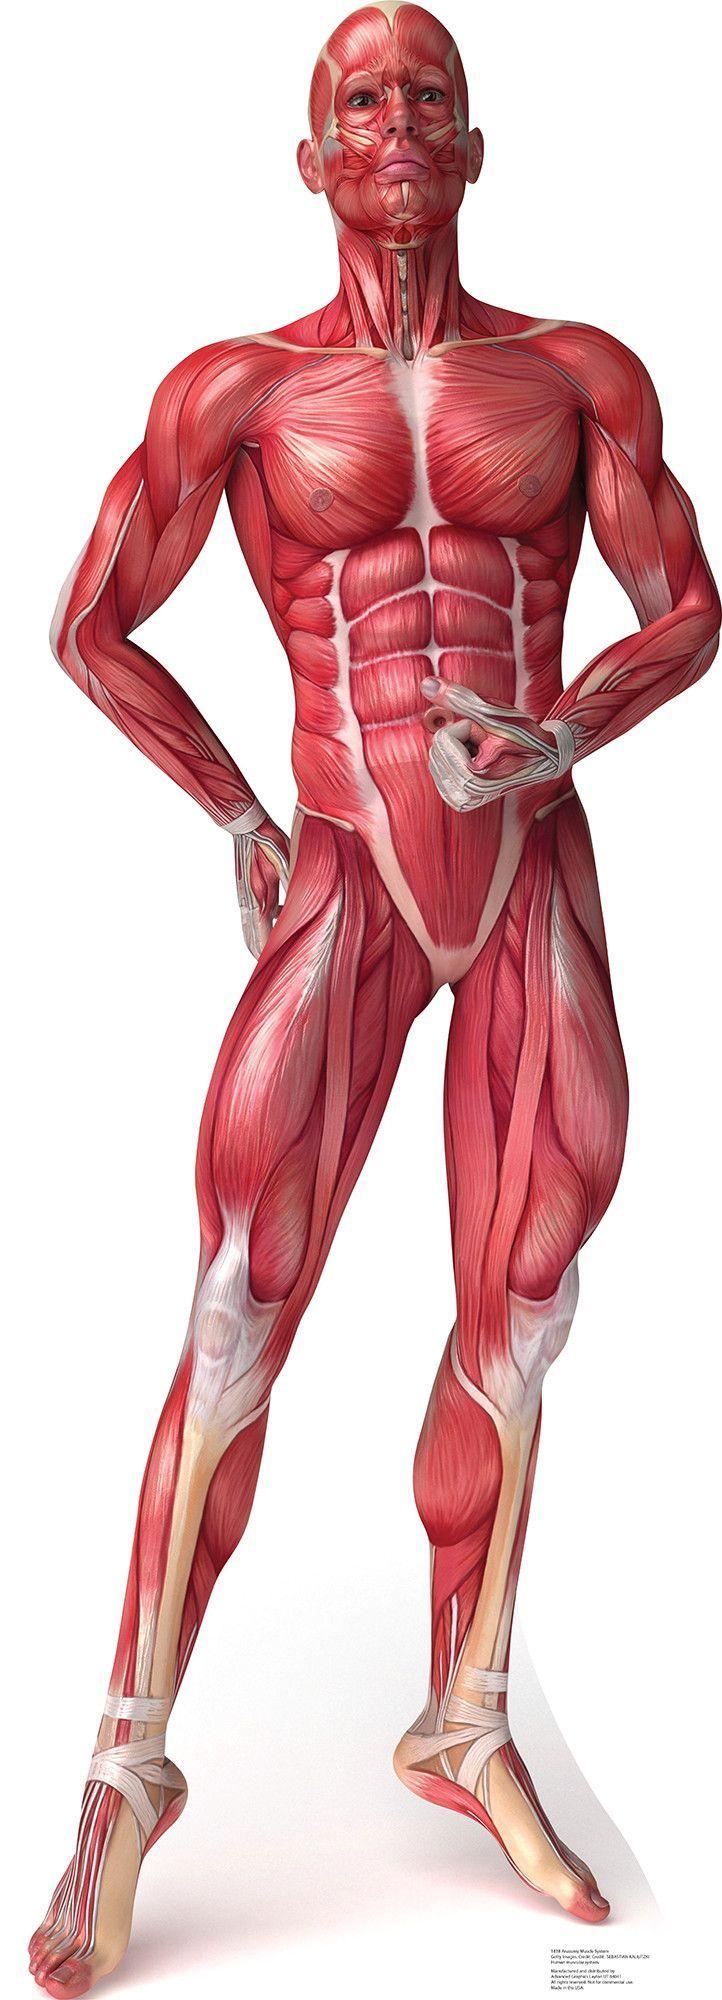 musculos | ANATOMÍA | Pinterest | Anatomy, Free and Human anatomy